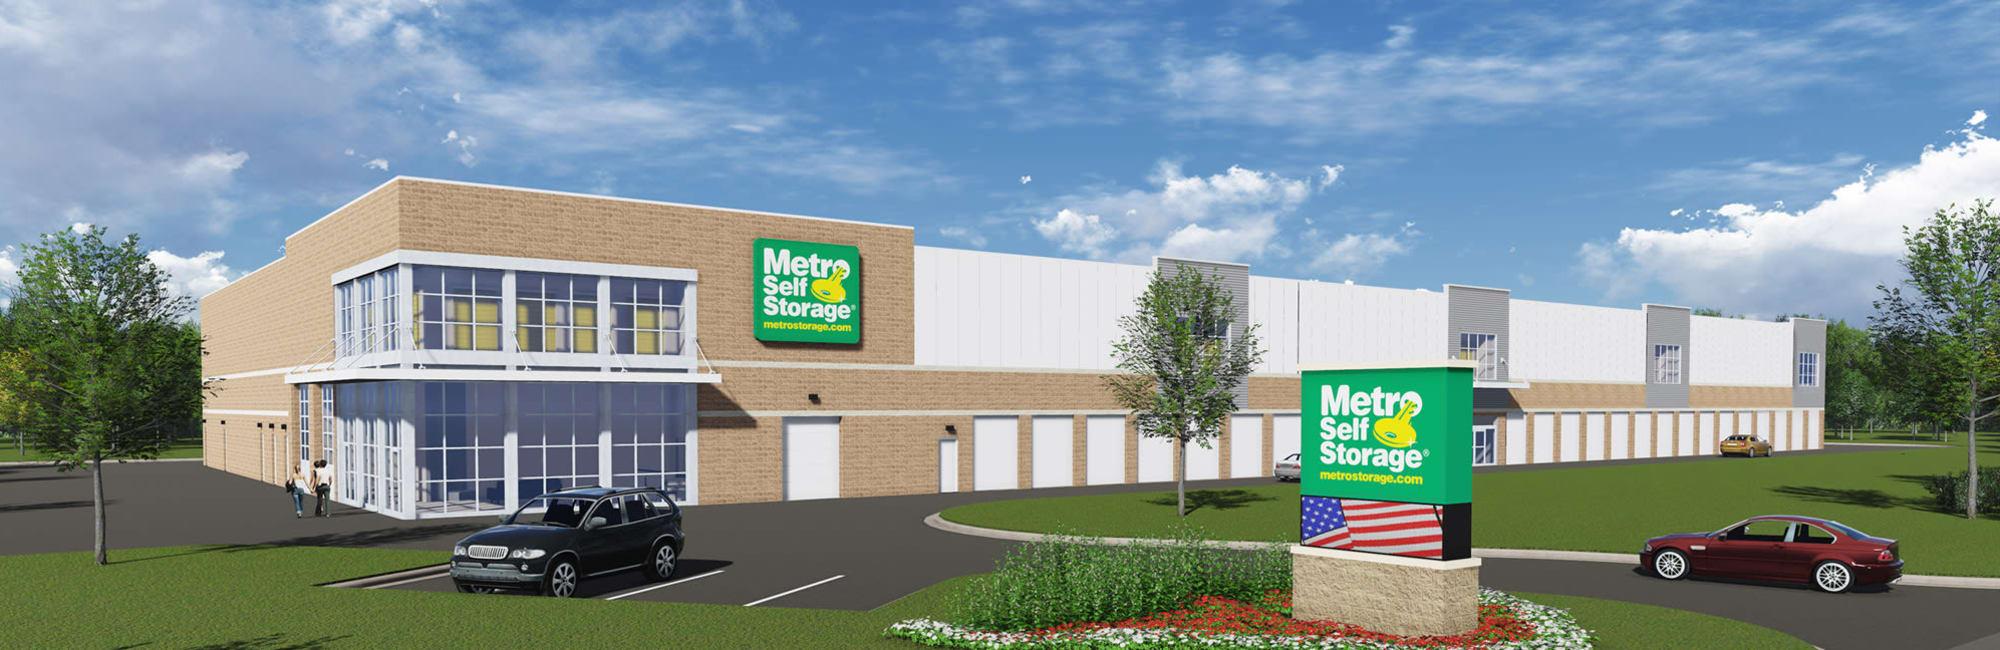 Metro Self Storage in Line Lexington, Pennsylvania